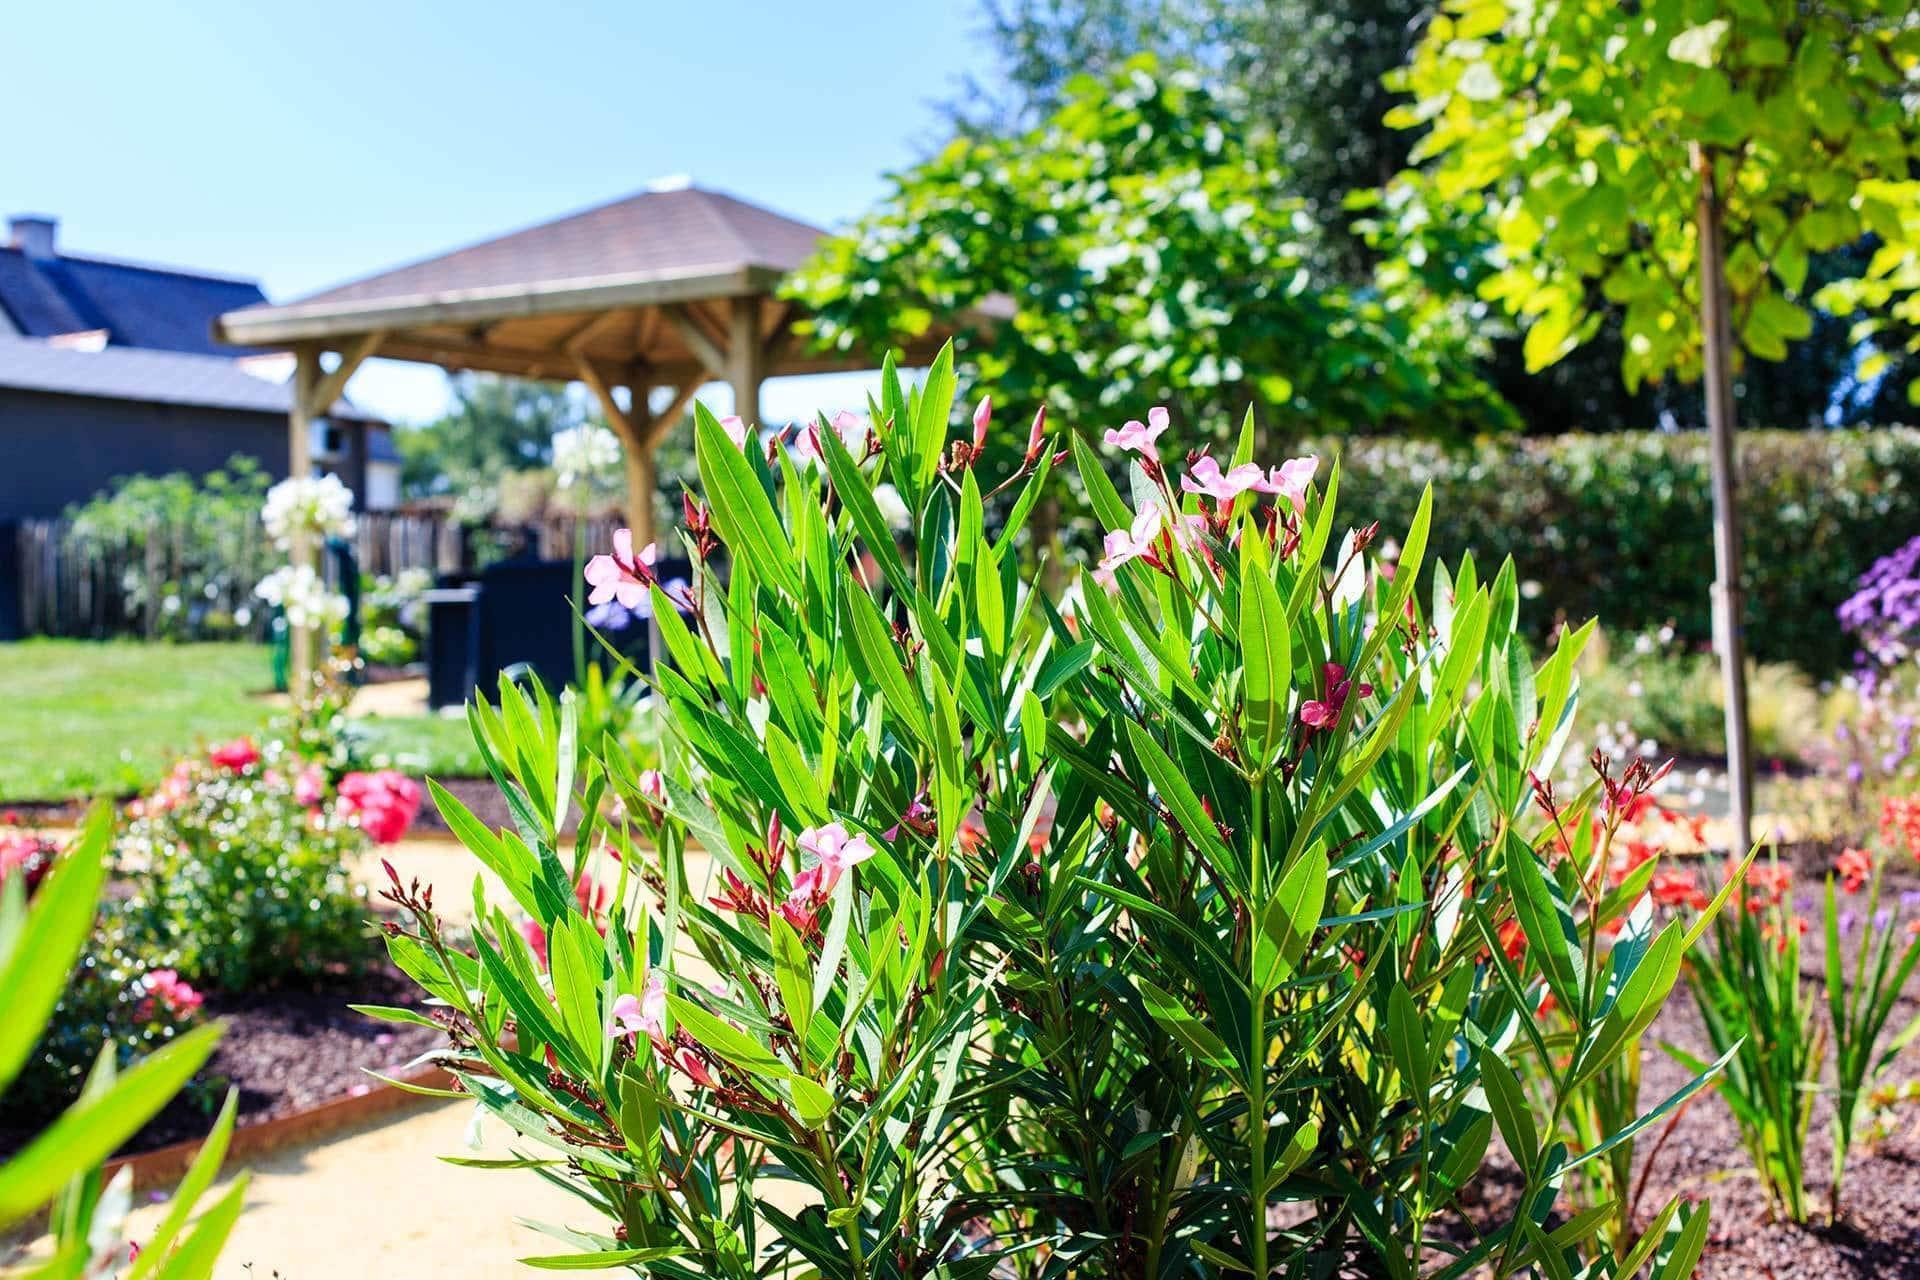 Fleurs-et-jardins-emmanuel-loirat--paysagiste-herbignac-guérande-la-baule